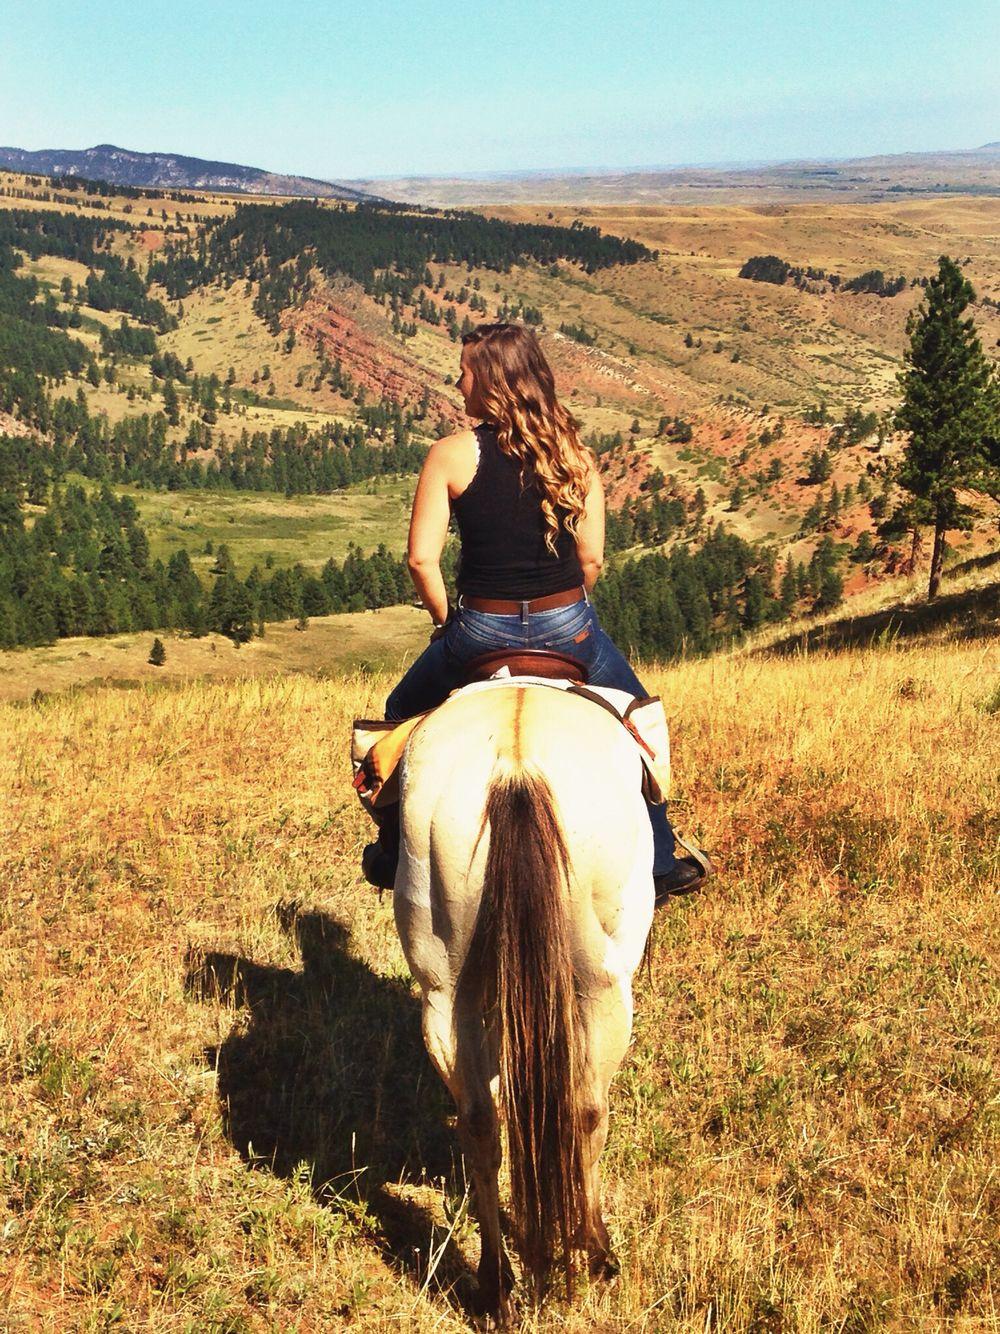 Eatons ranch wy dude ranch eaton ranch